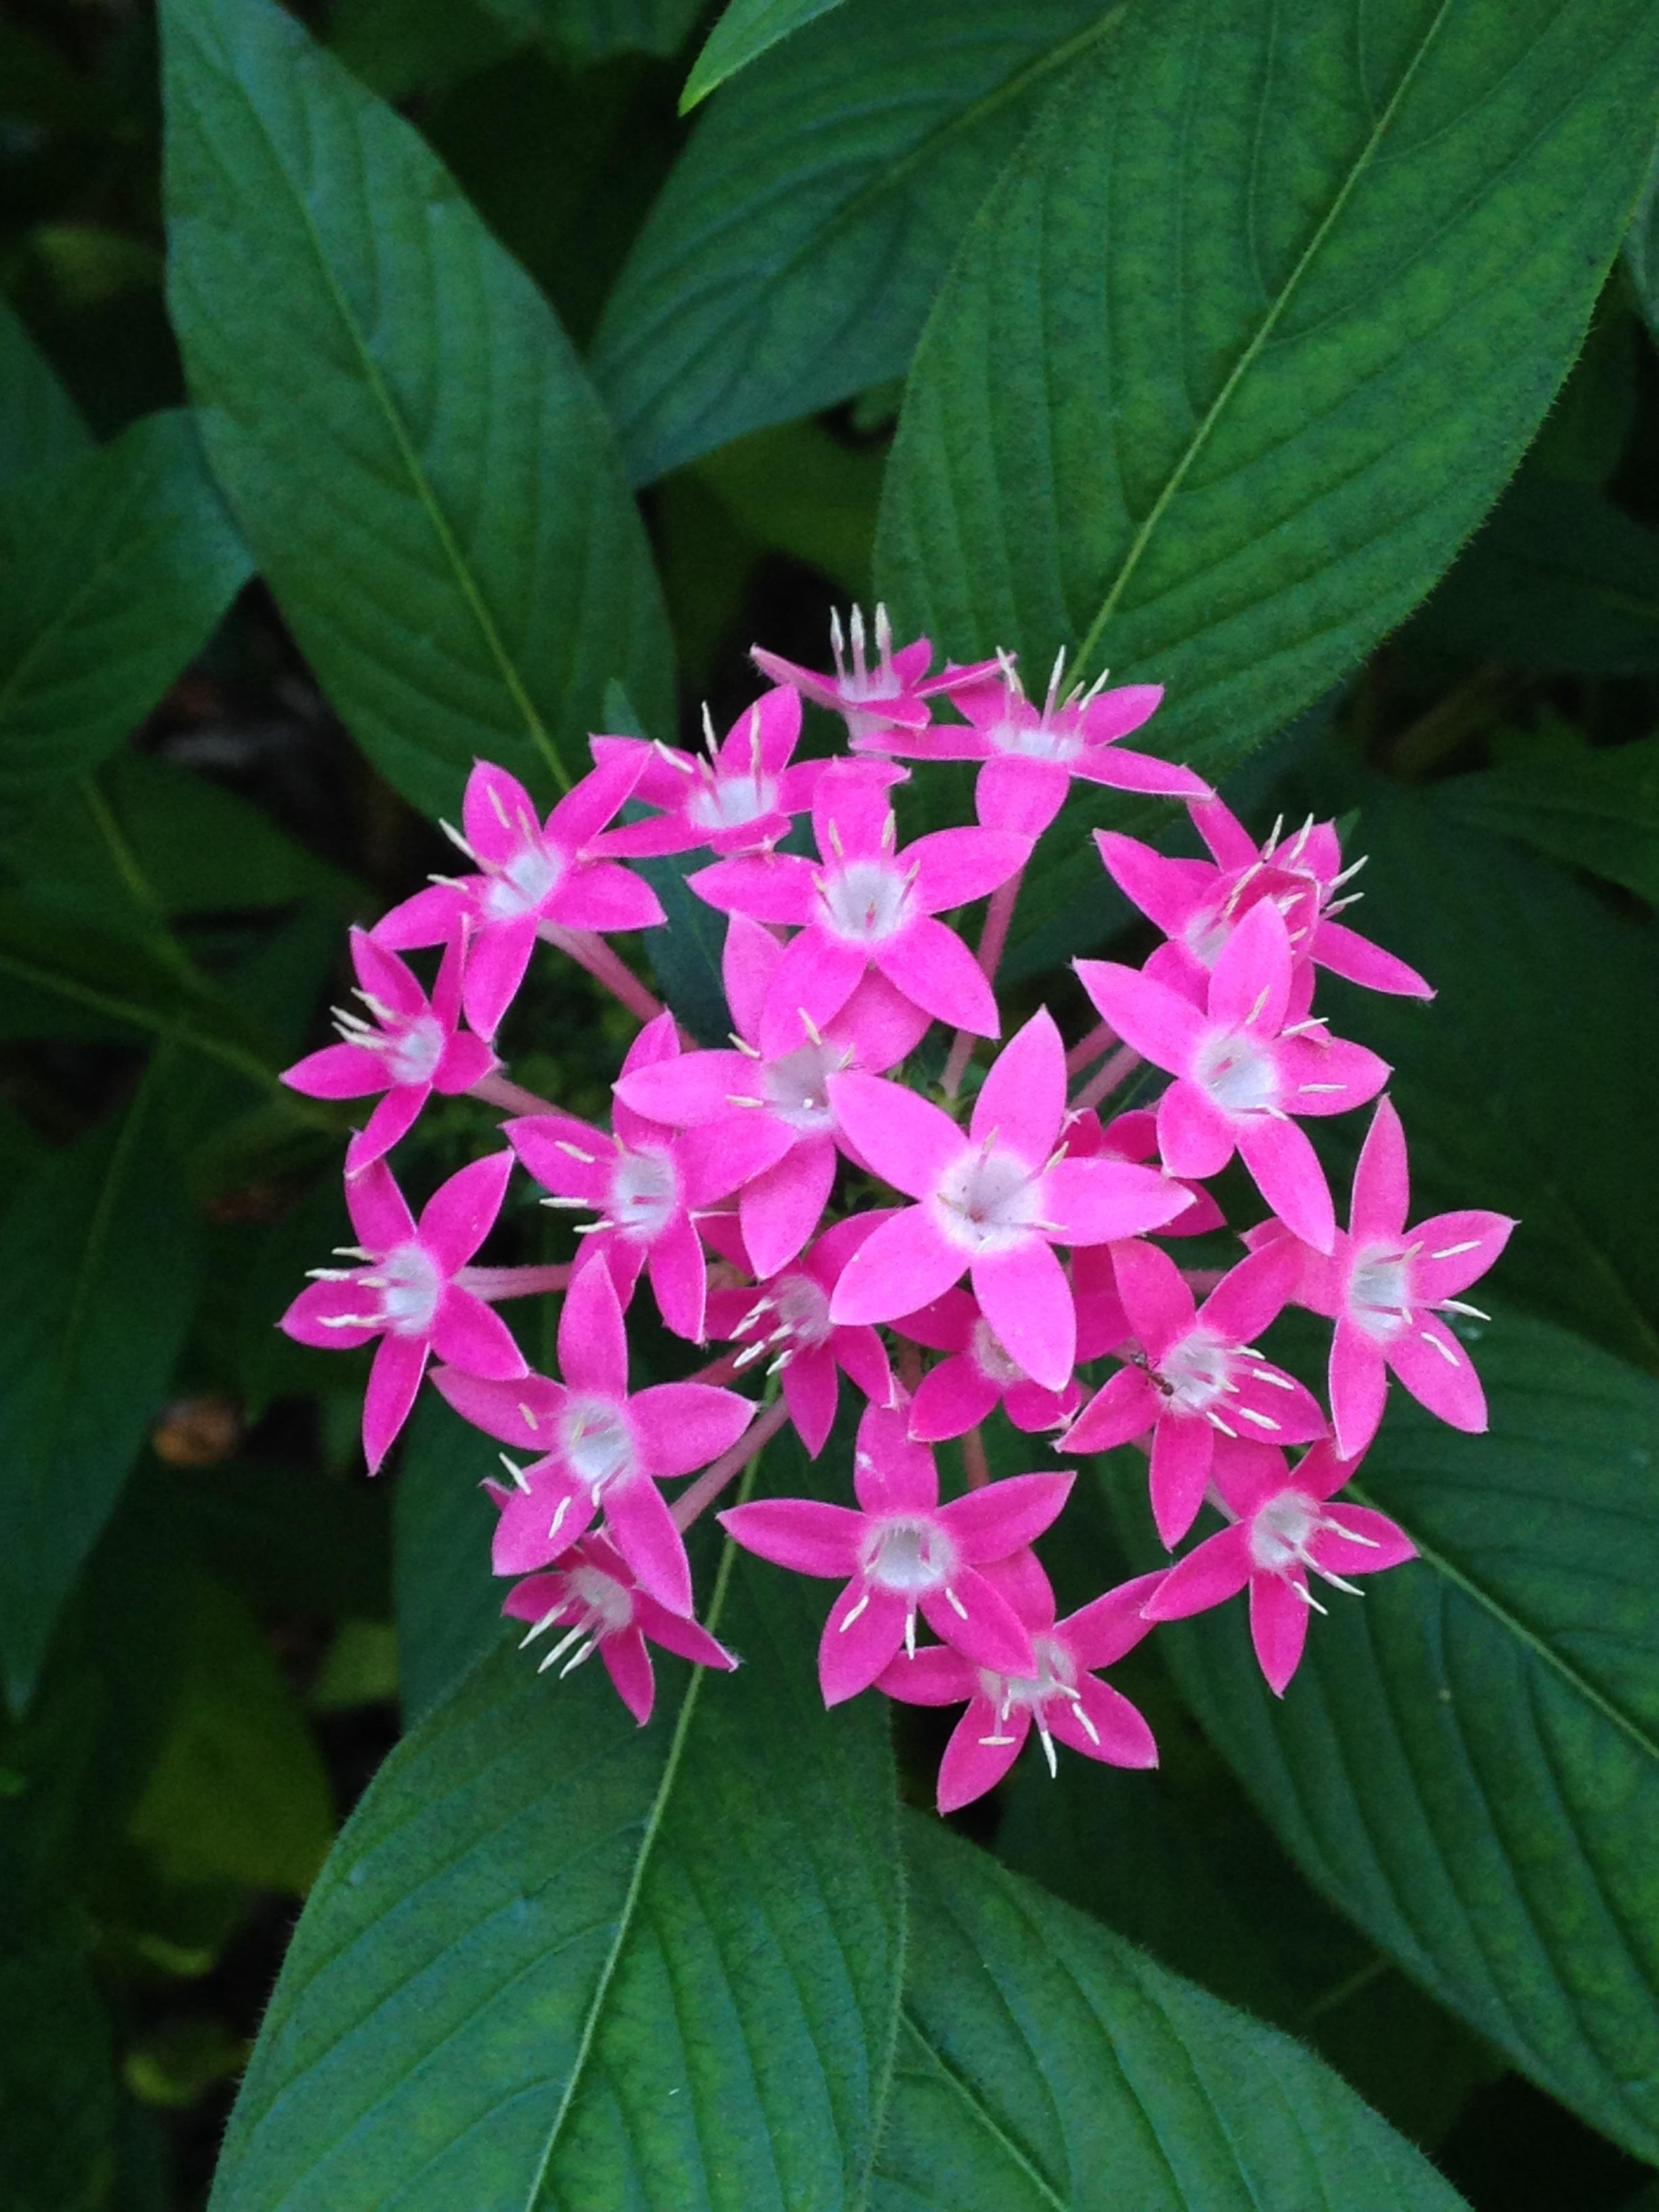 Kostenlose Foto Blatt Blume Blütenblatt Blumen Laub Frühling